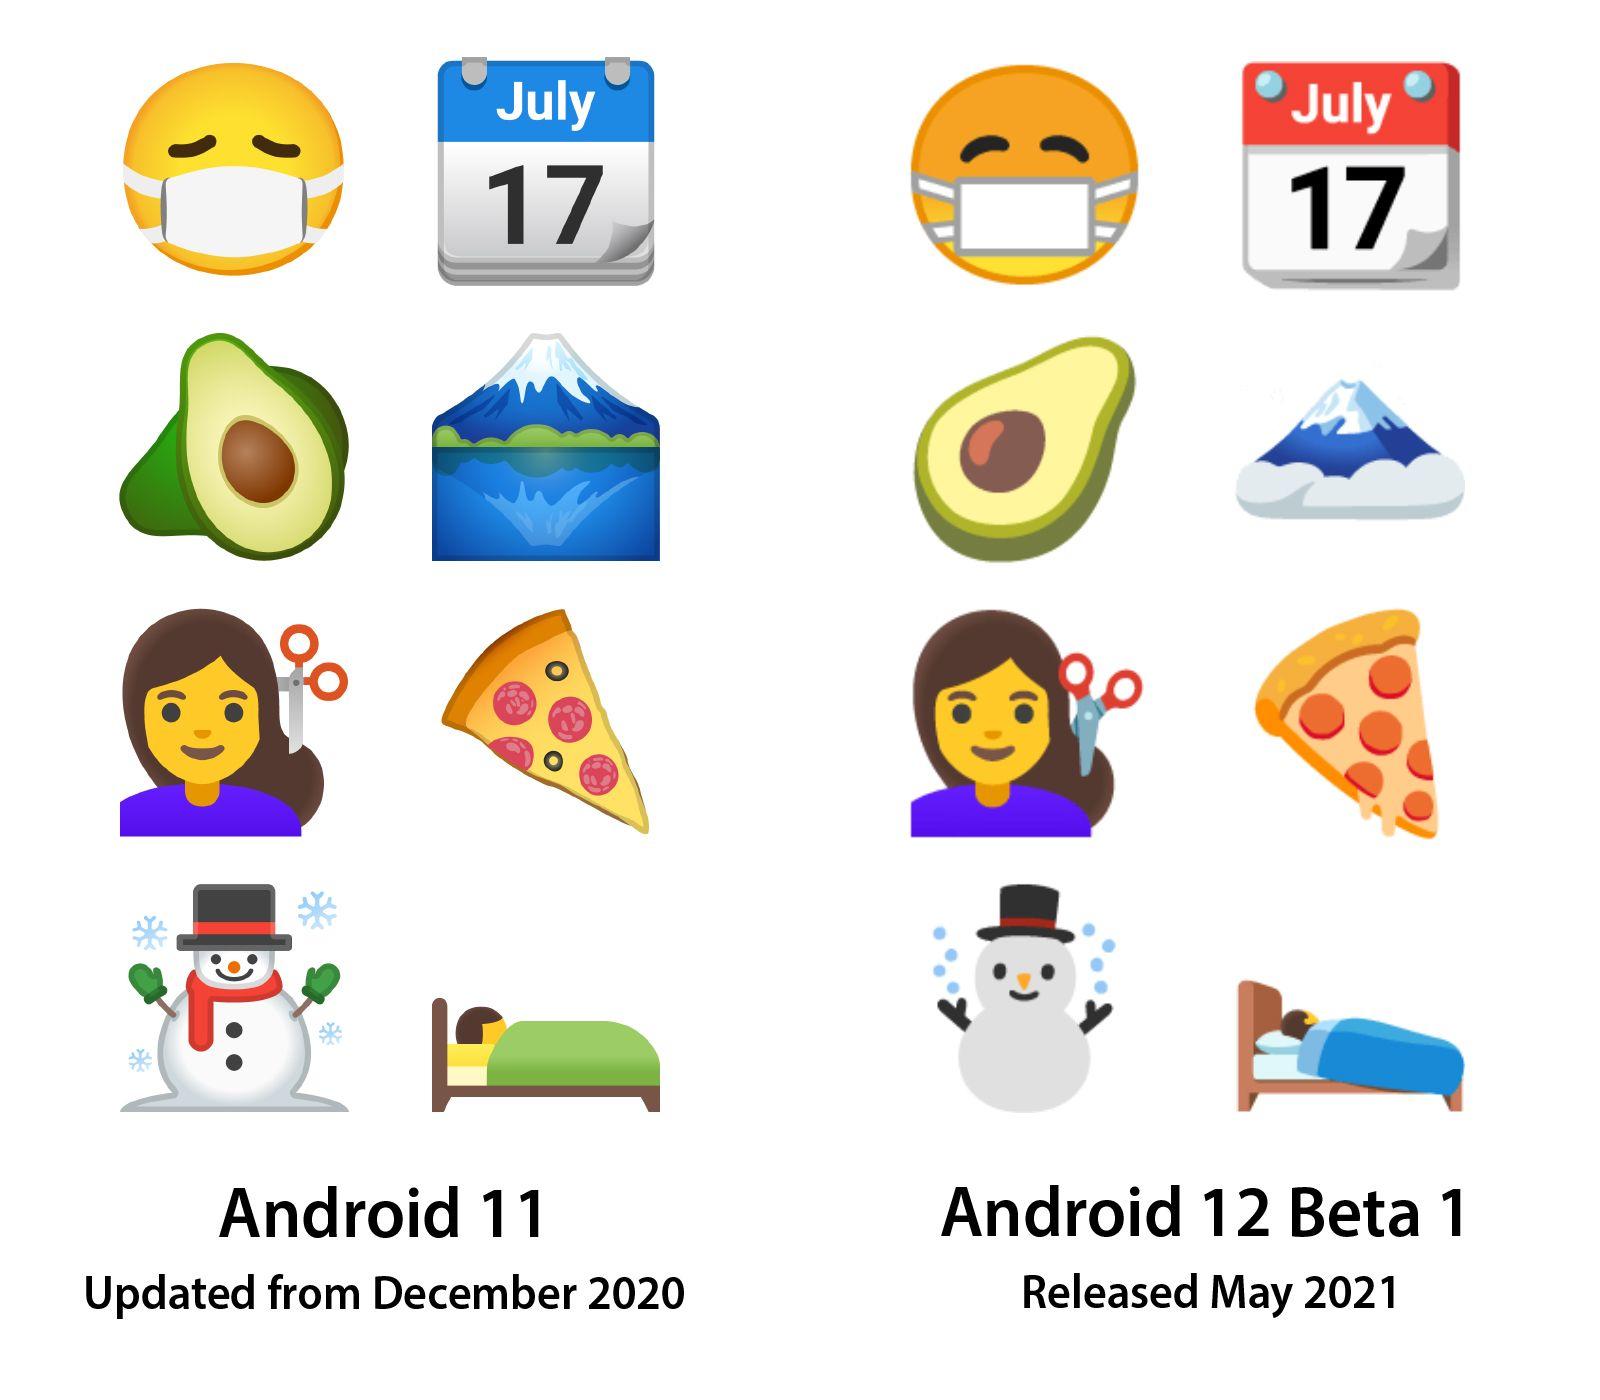 Emojipedia-Android-12_0-Beta-Changed-Comparison-1